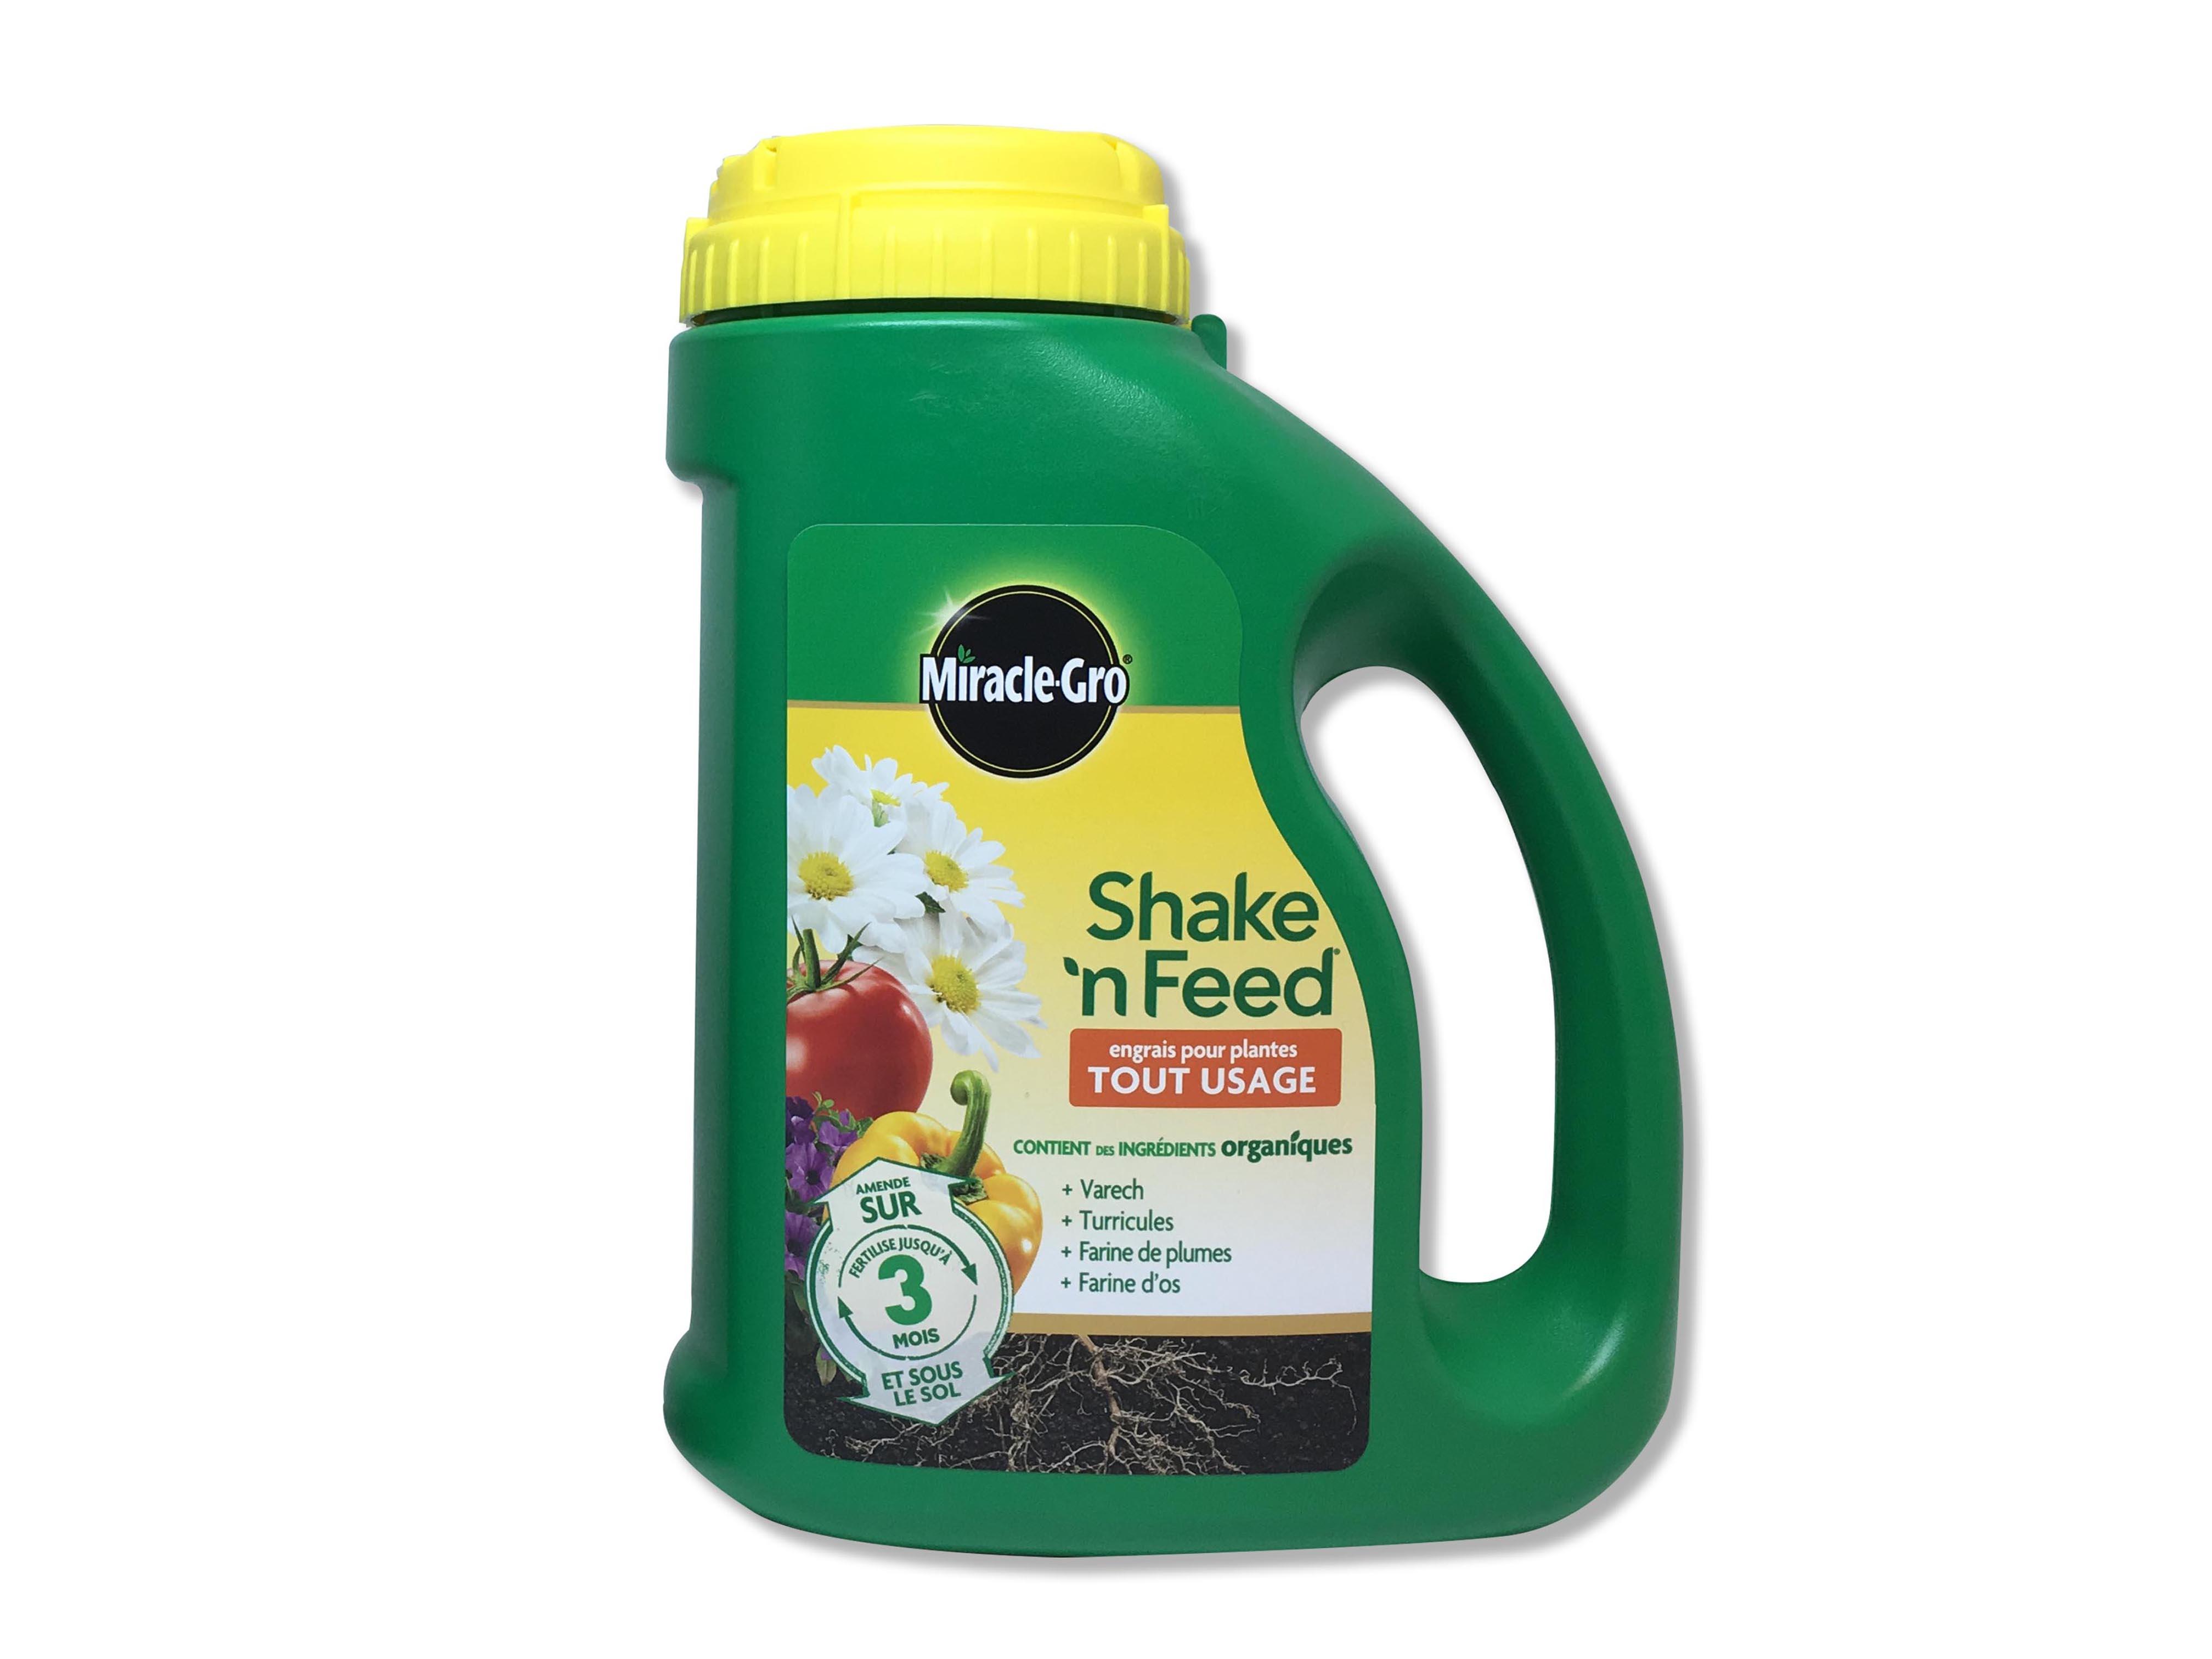 https://0901.nccdn.net/4_2/000/000/053/0e8/Micrcale-Gro-Shake-n-Feed-4032x3024.jpg